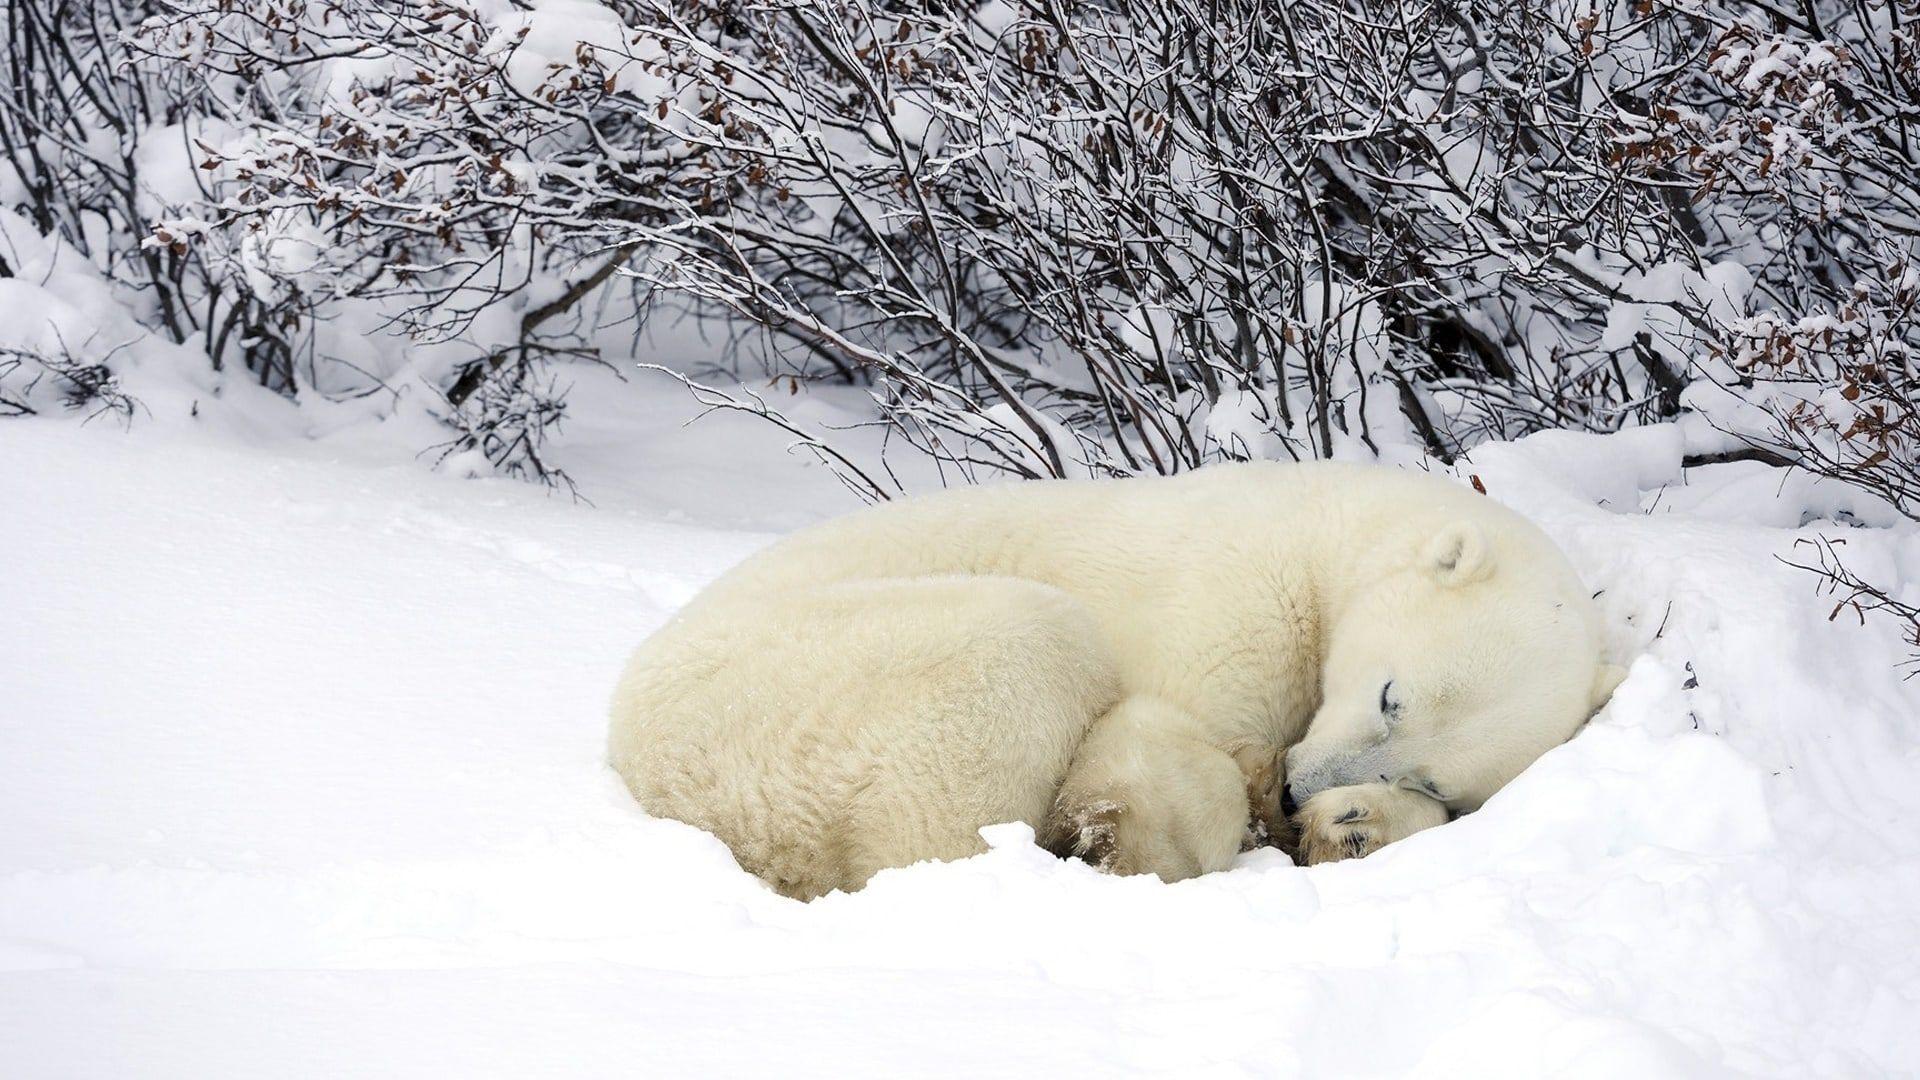 Ours Polaires Polar Bears Voyage Onirique En 2020 Ours Polaire Bebe Ours Polaires Fond D Ecran Ours